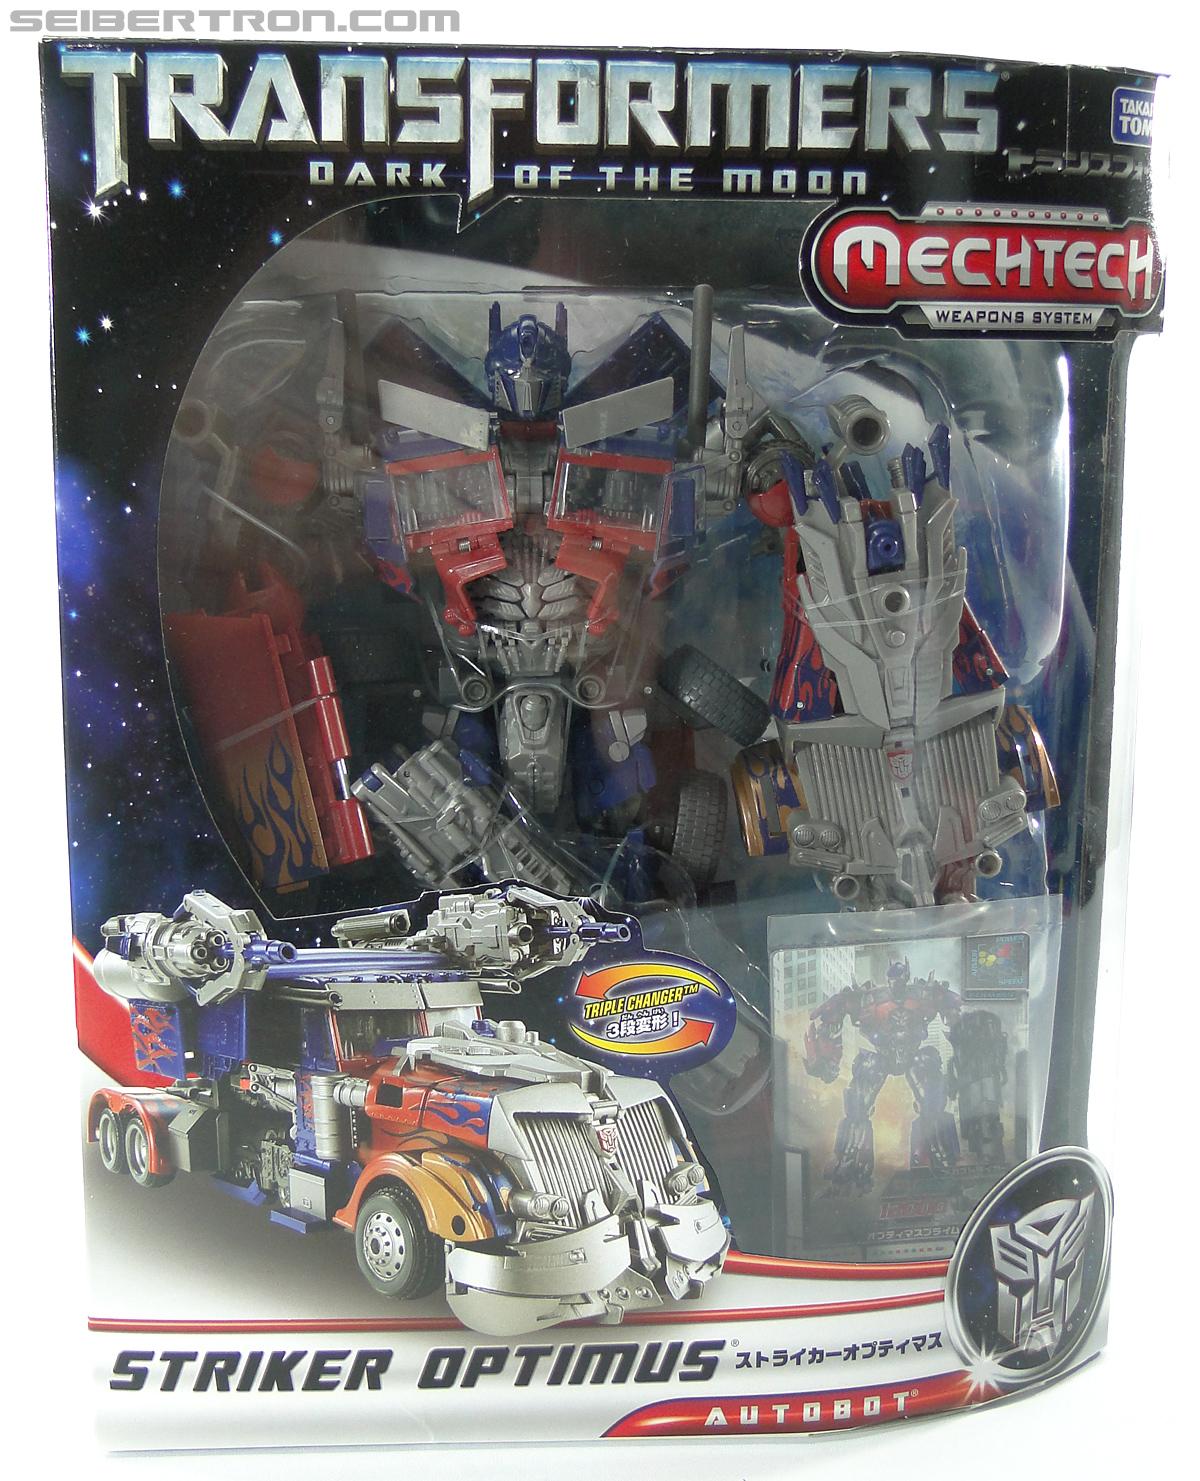 Transformers Dark of the Moon Striker Optimus Prime (Image #1 of 228)